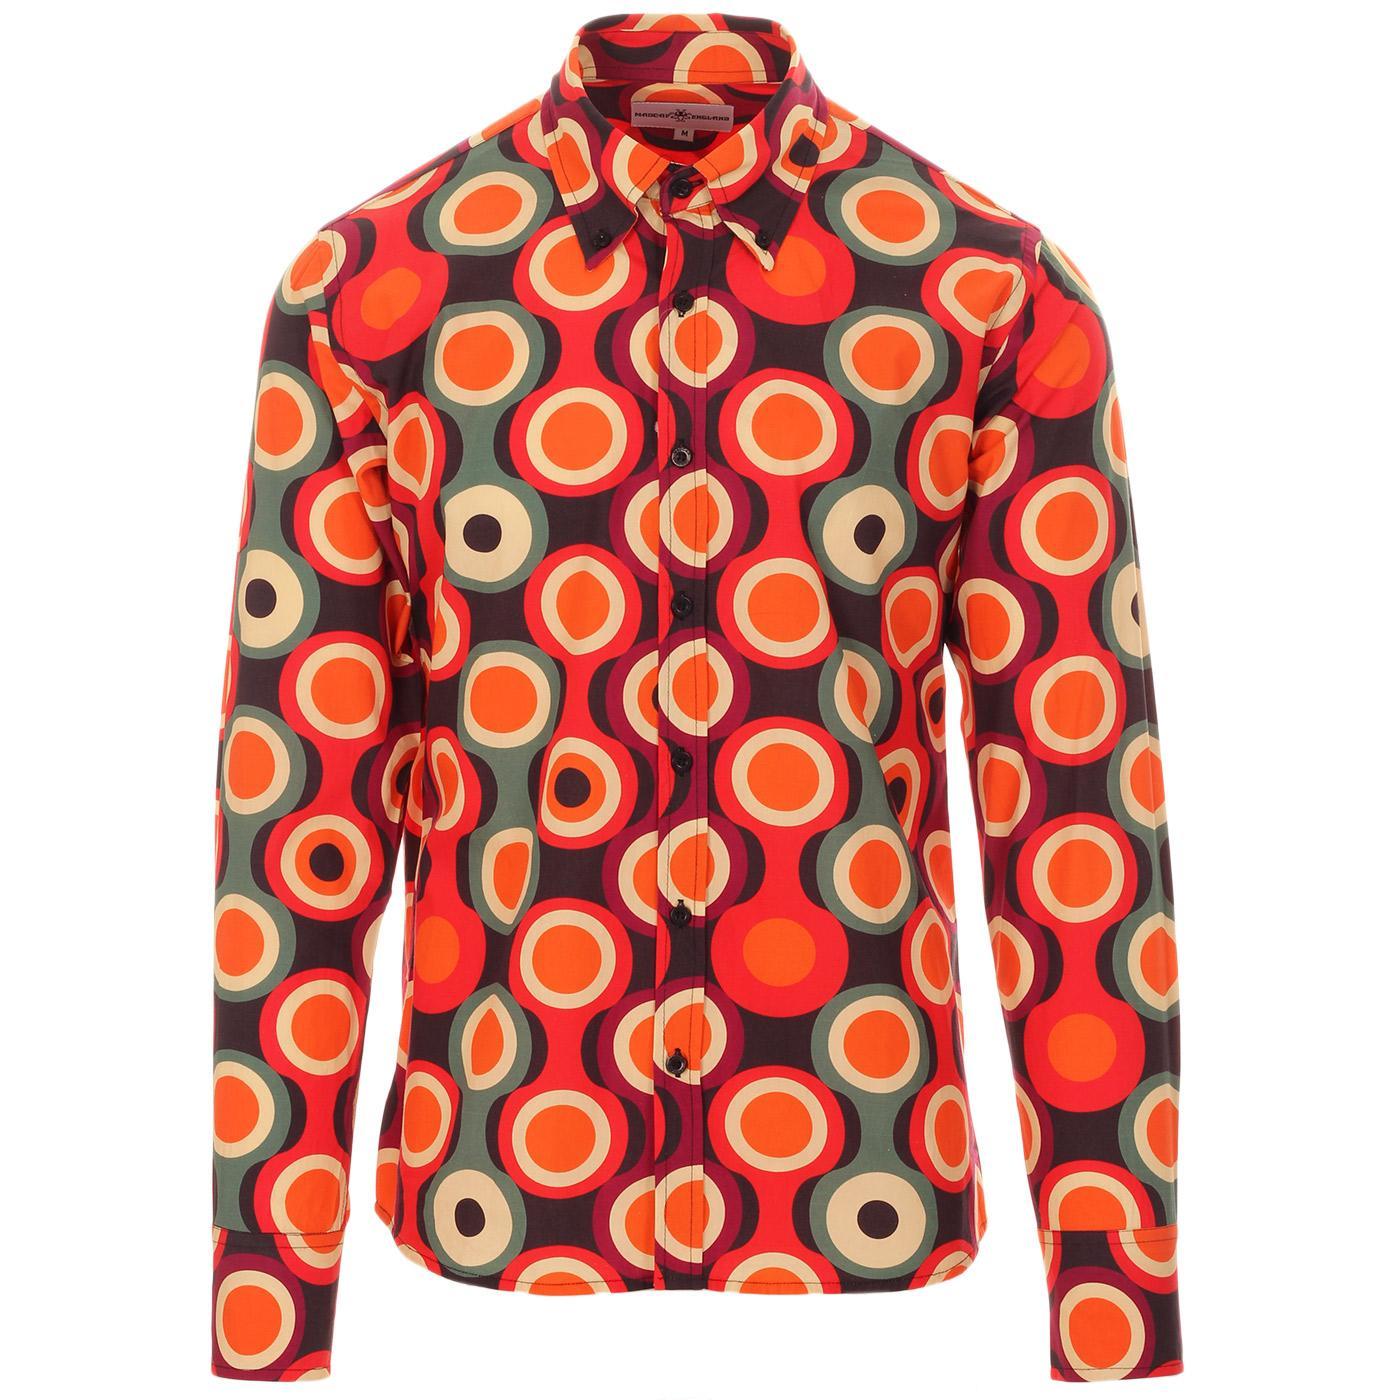 Trip Psych-Out Circle MADCAP ENGLAND Mod Shirt B/R